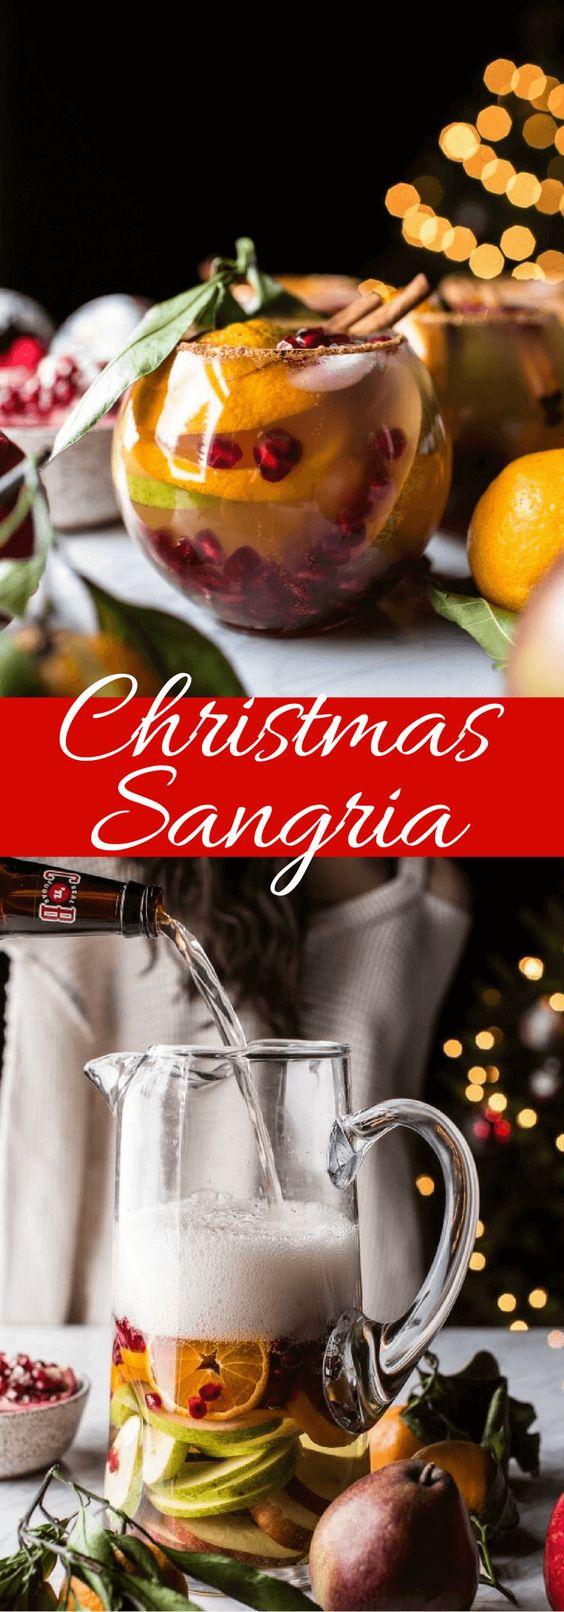 Christmas Sangria | halfbakedharvest.com @hbharvest: